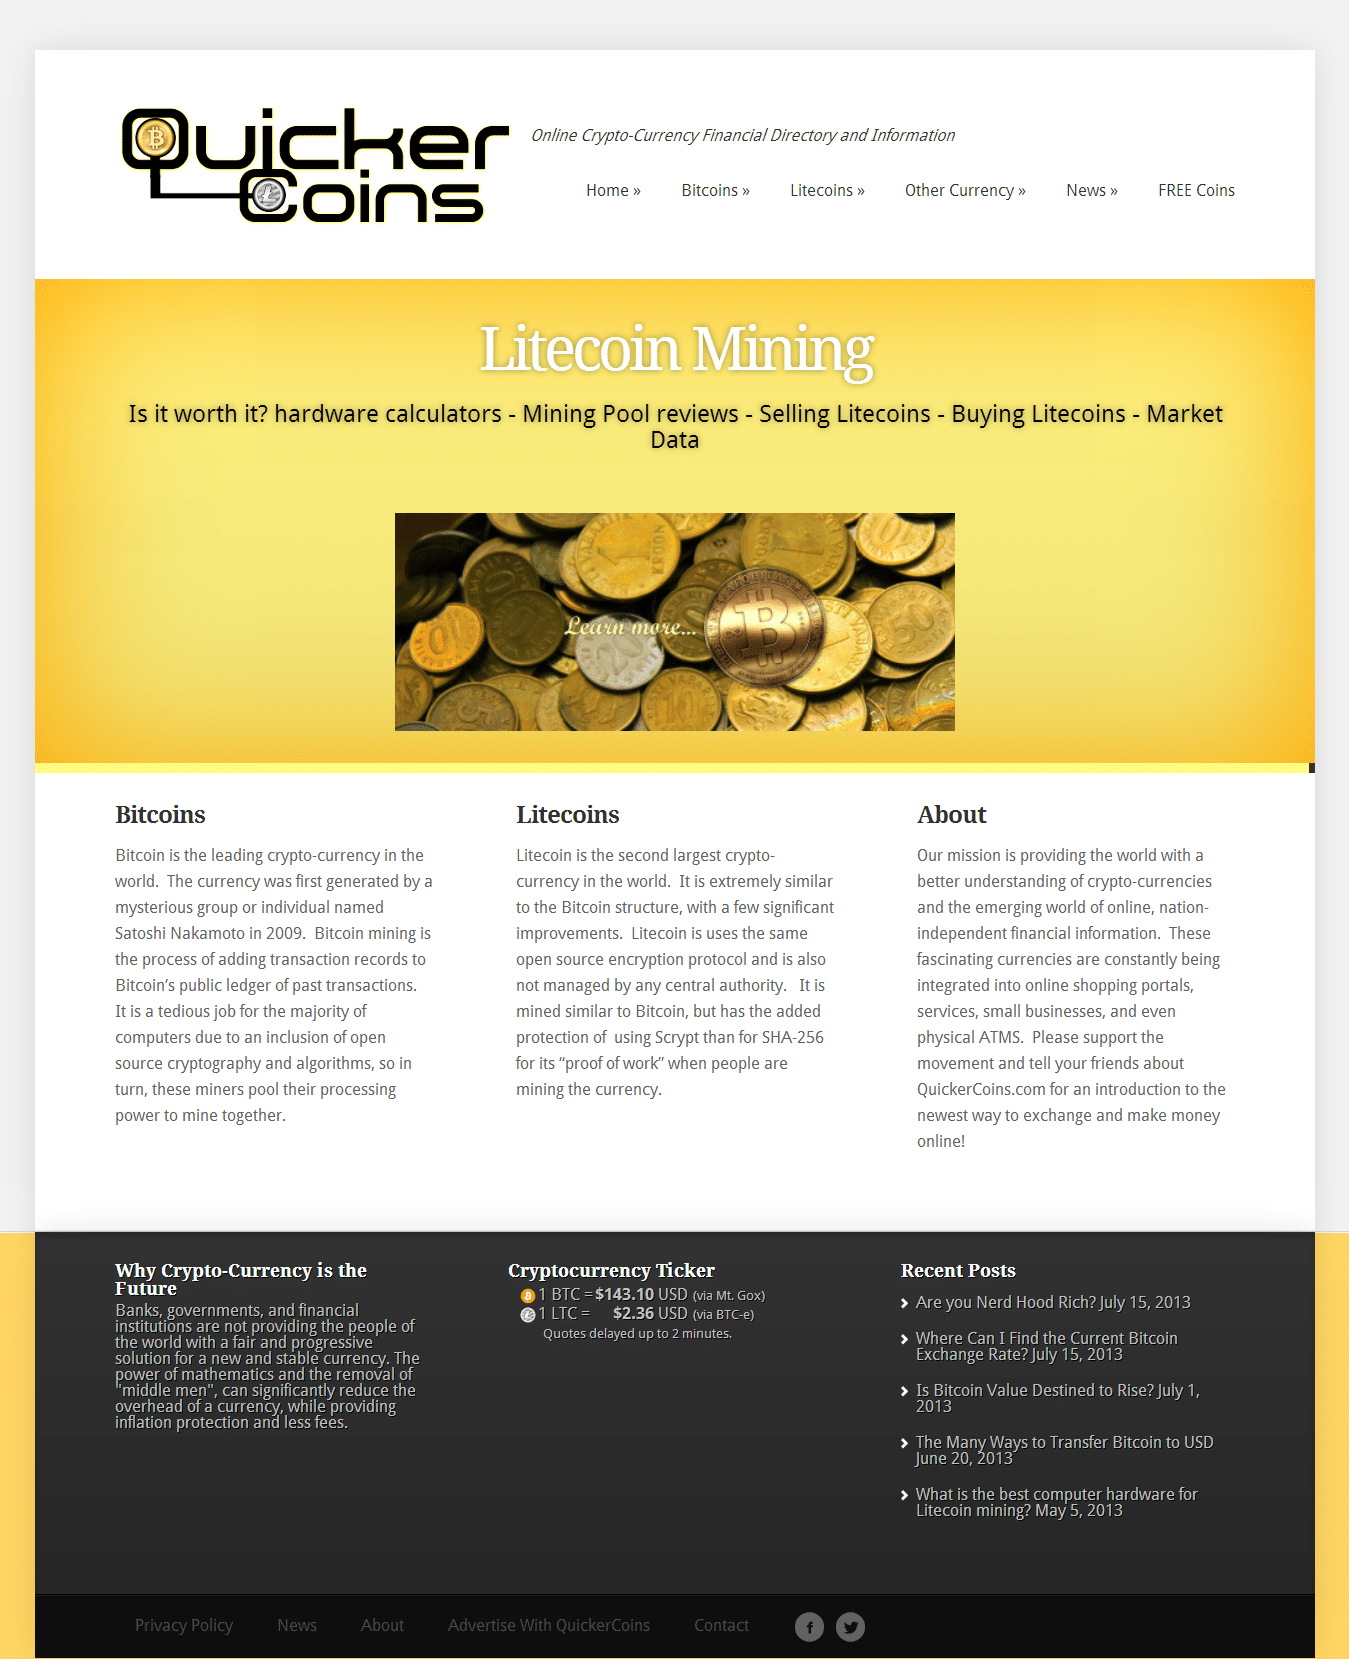 Quickercoins.com website